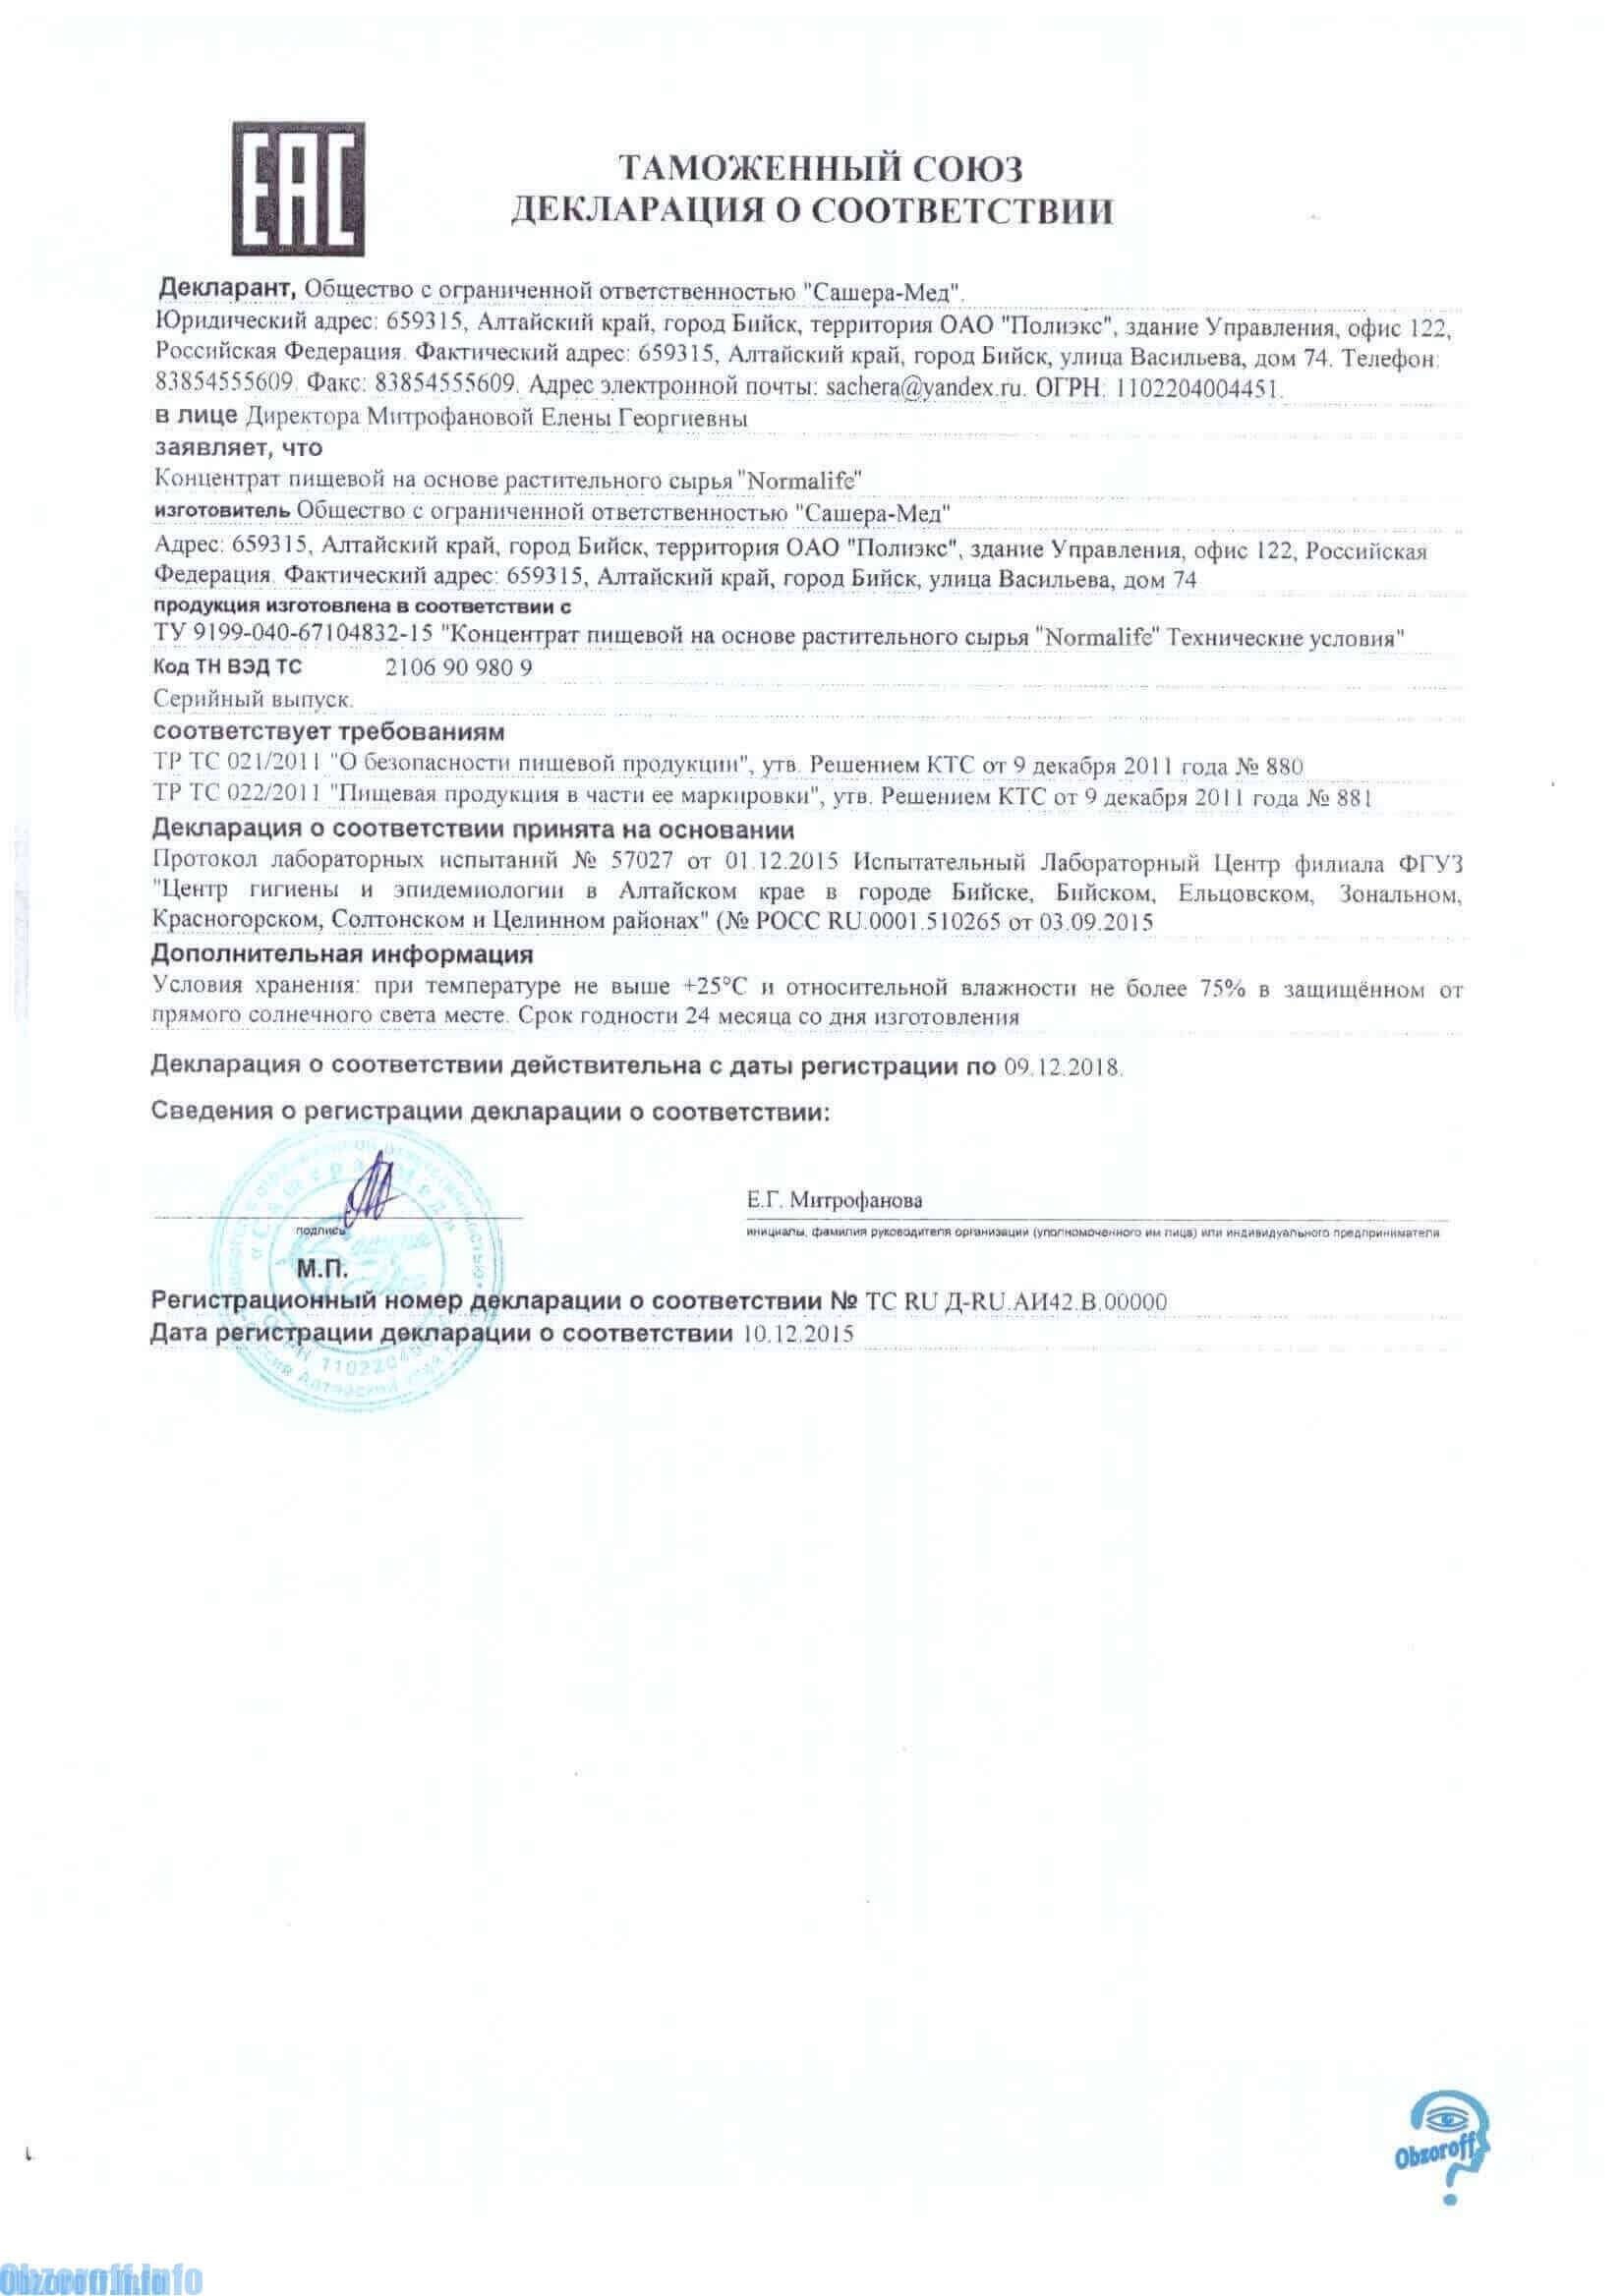 Dokumentacija o drogah Normalife